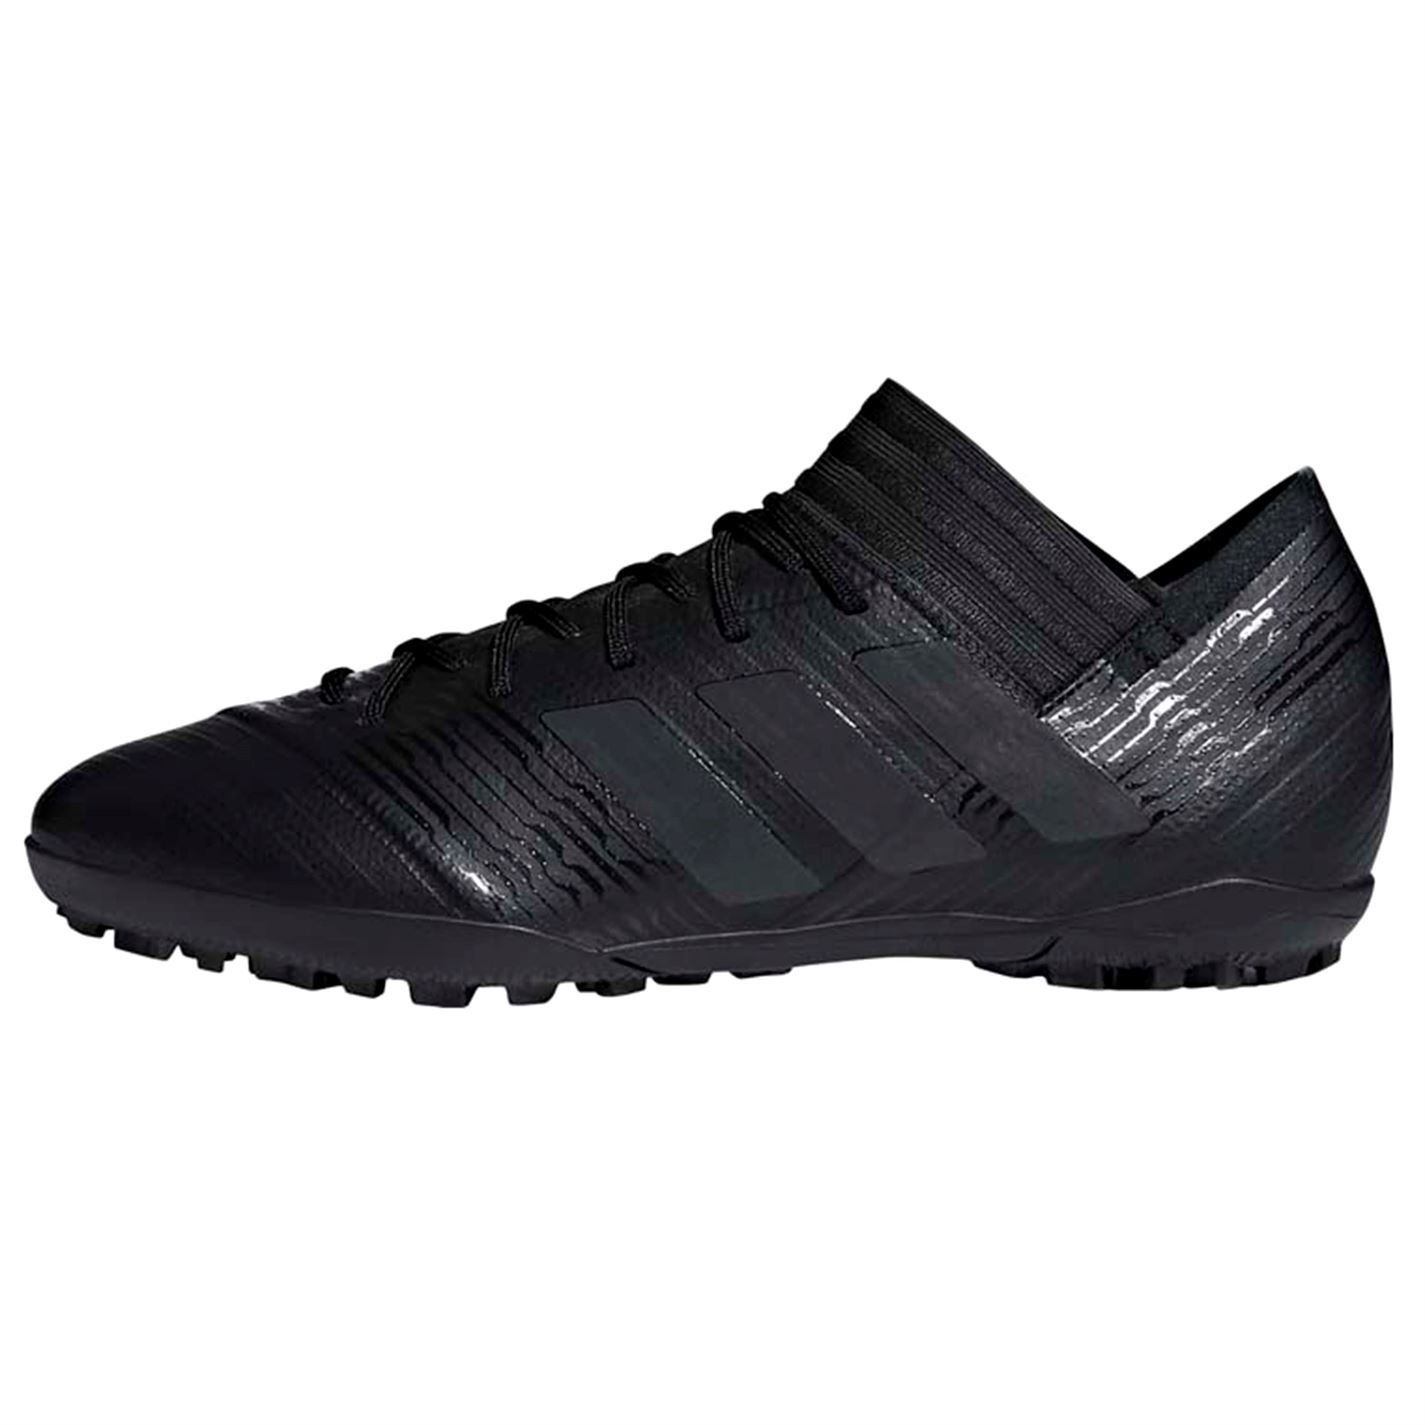 b9bbe4083e45 ... adidas Nemeziz Tango 17.3 Astro Turf Football Trainers Black Mens Soccer  Shoes ...